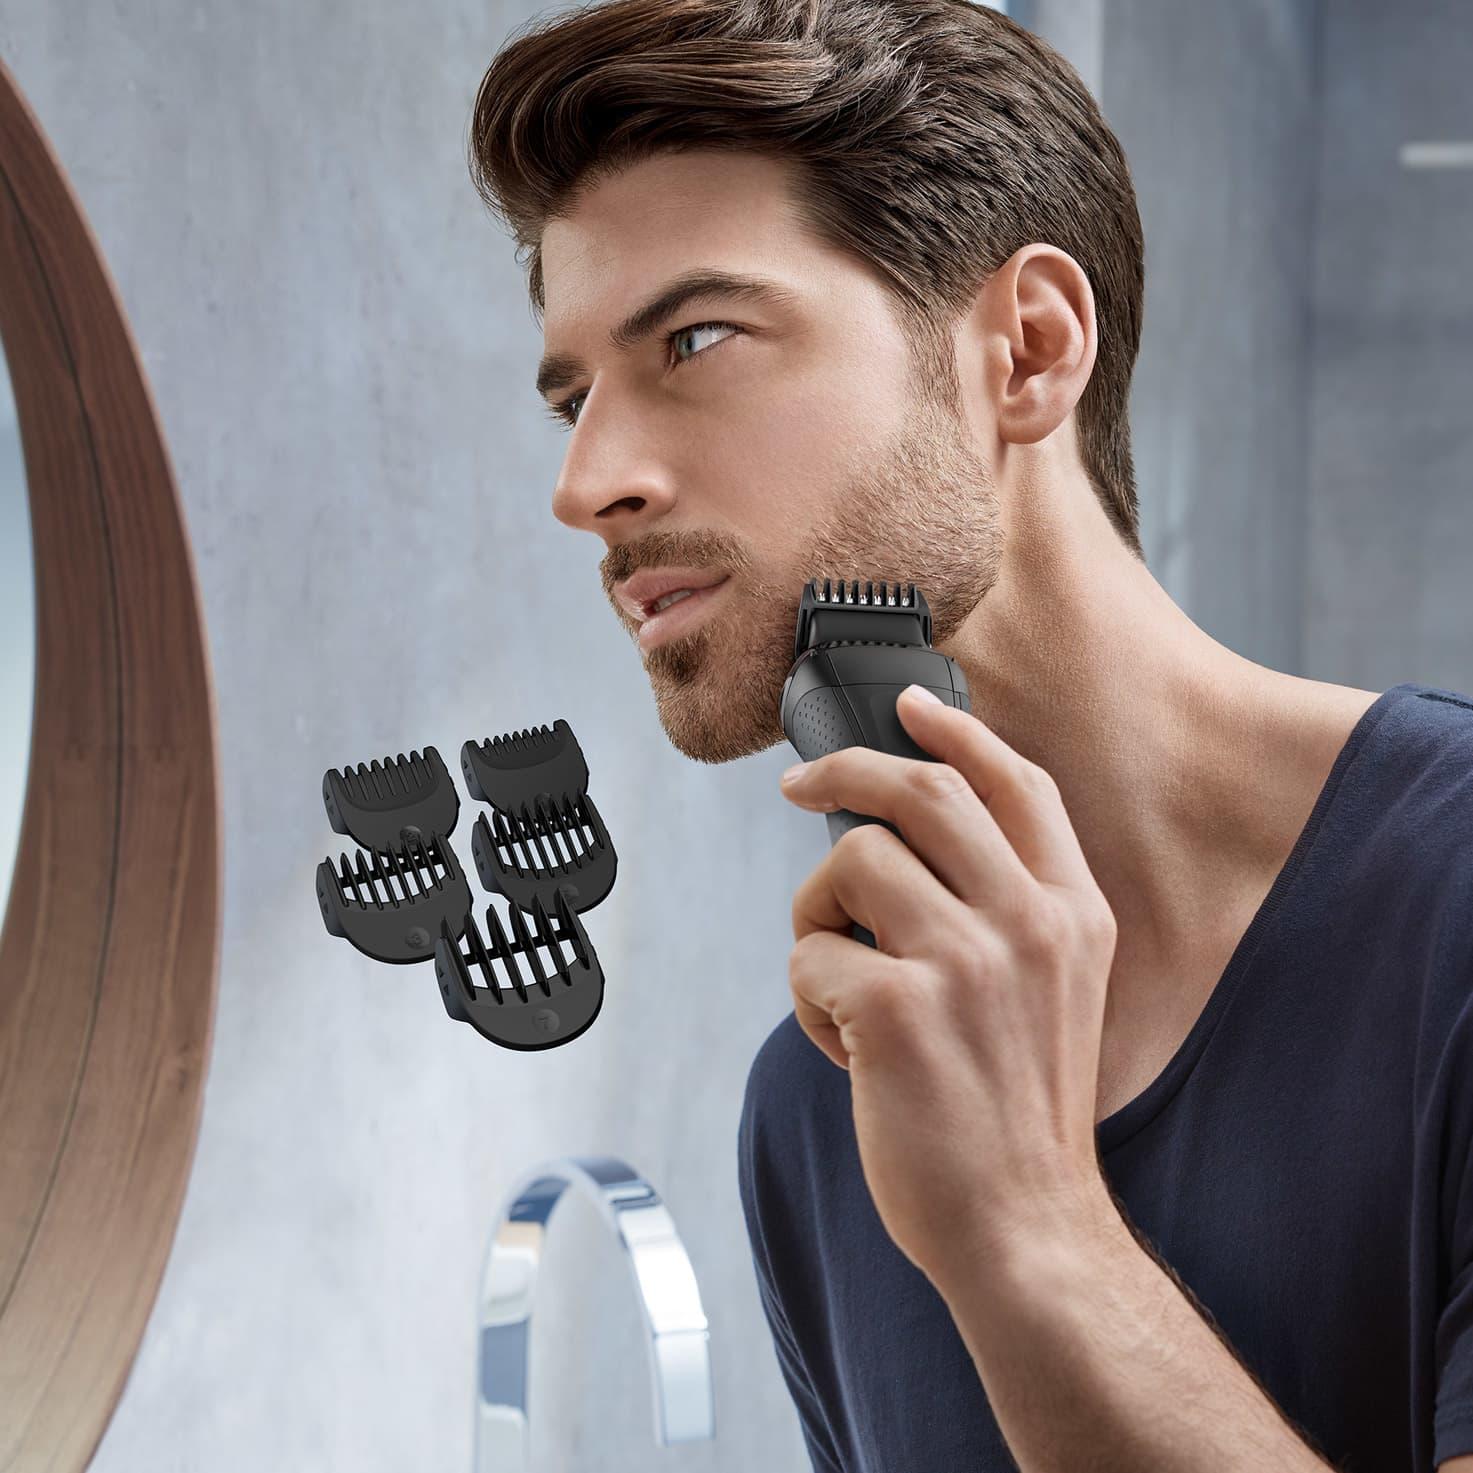 Braun Multi Grooming BT3000 4